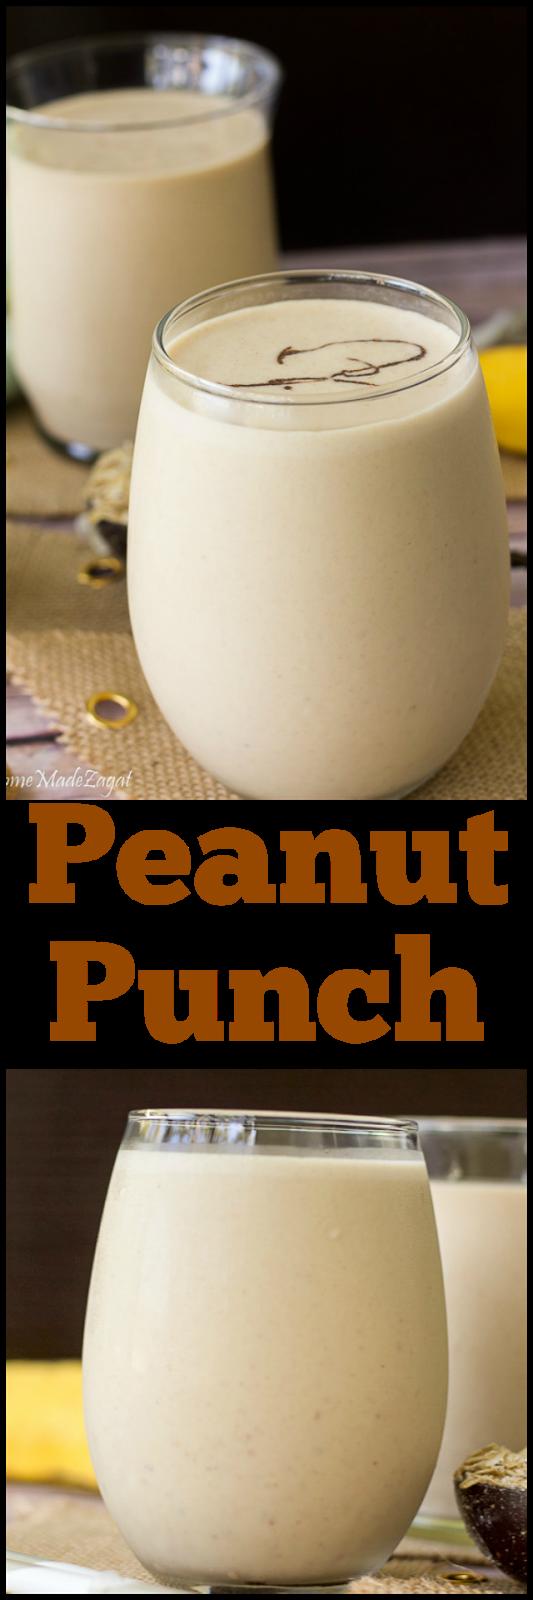 Caribbean Peanut Punch